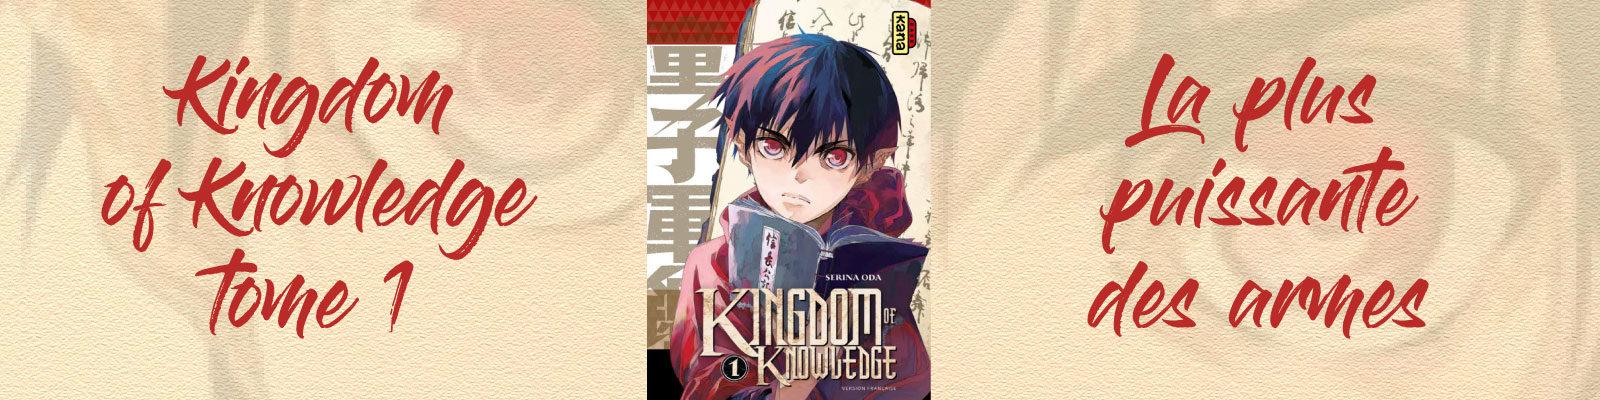 Kingdom of Knowledge-Vol.-1